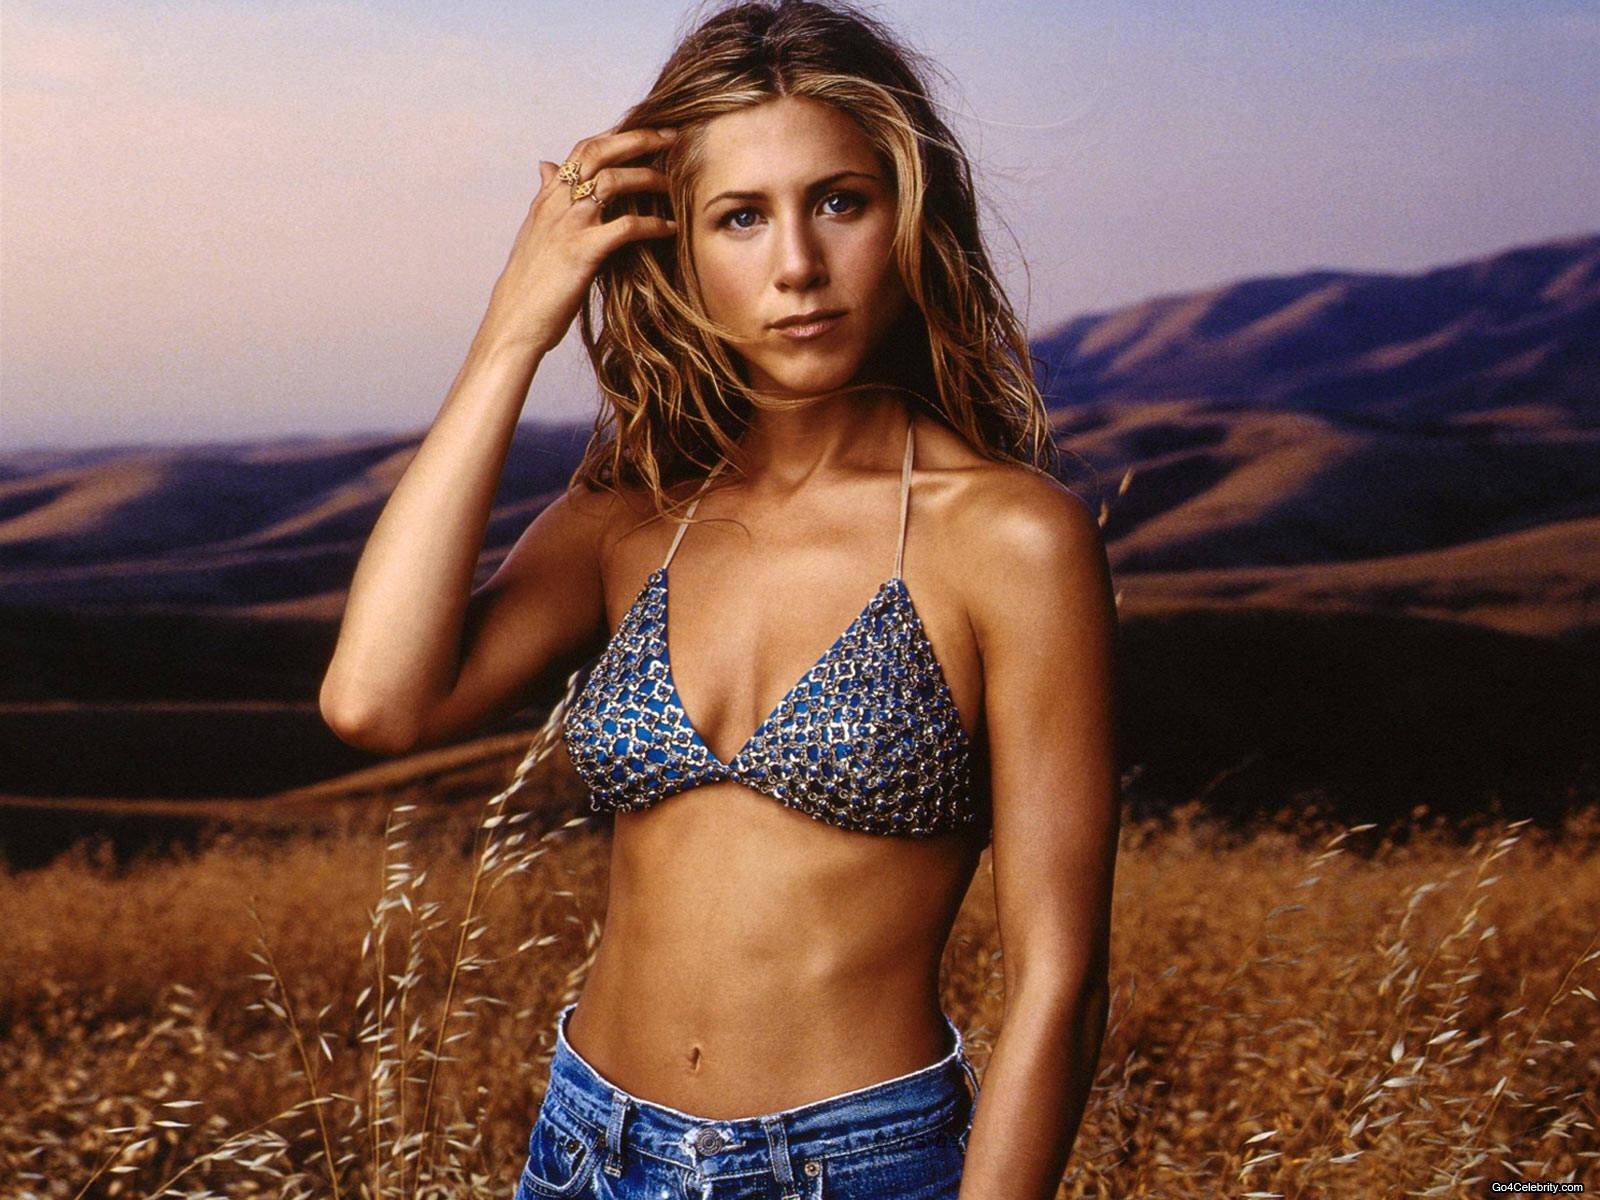 http://2.bp.blogspot.com/_CRsA2fUP4Ys/SxUosPECx1I/AAAAAAAAB6E/u3IzAaKfaPg/s1600/Jennifer+Aniston+6.jpg